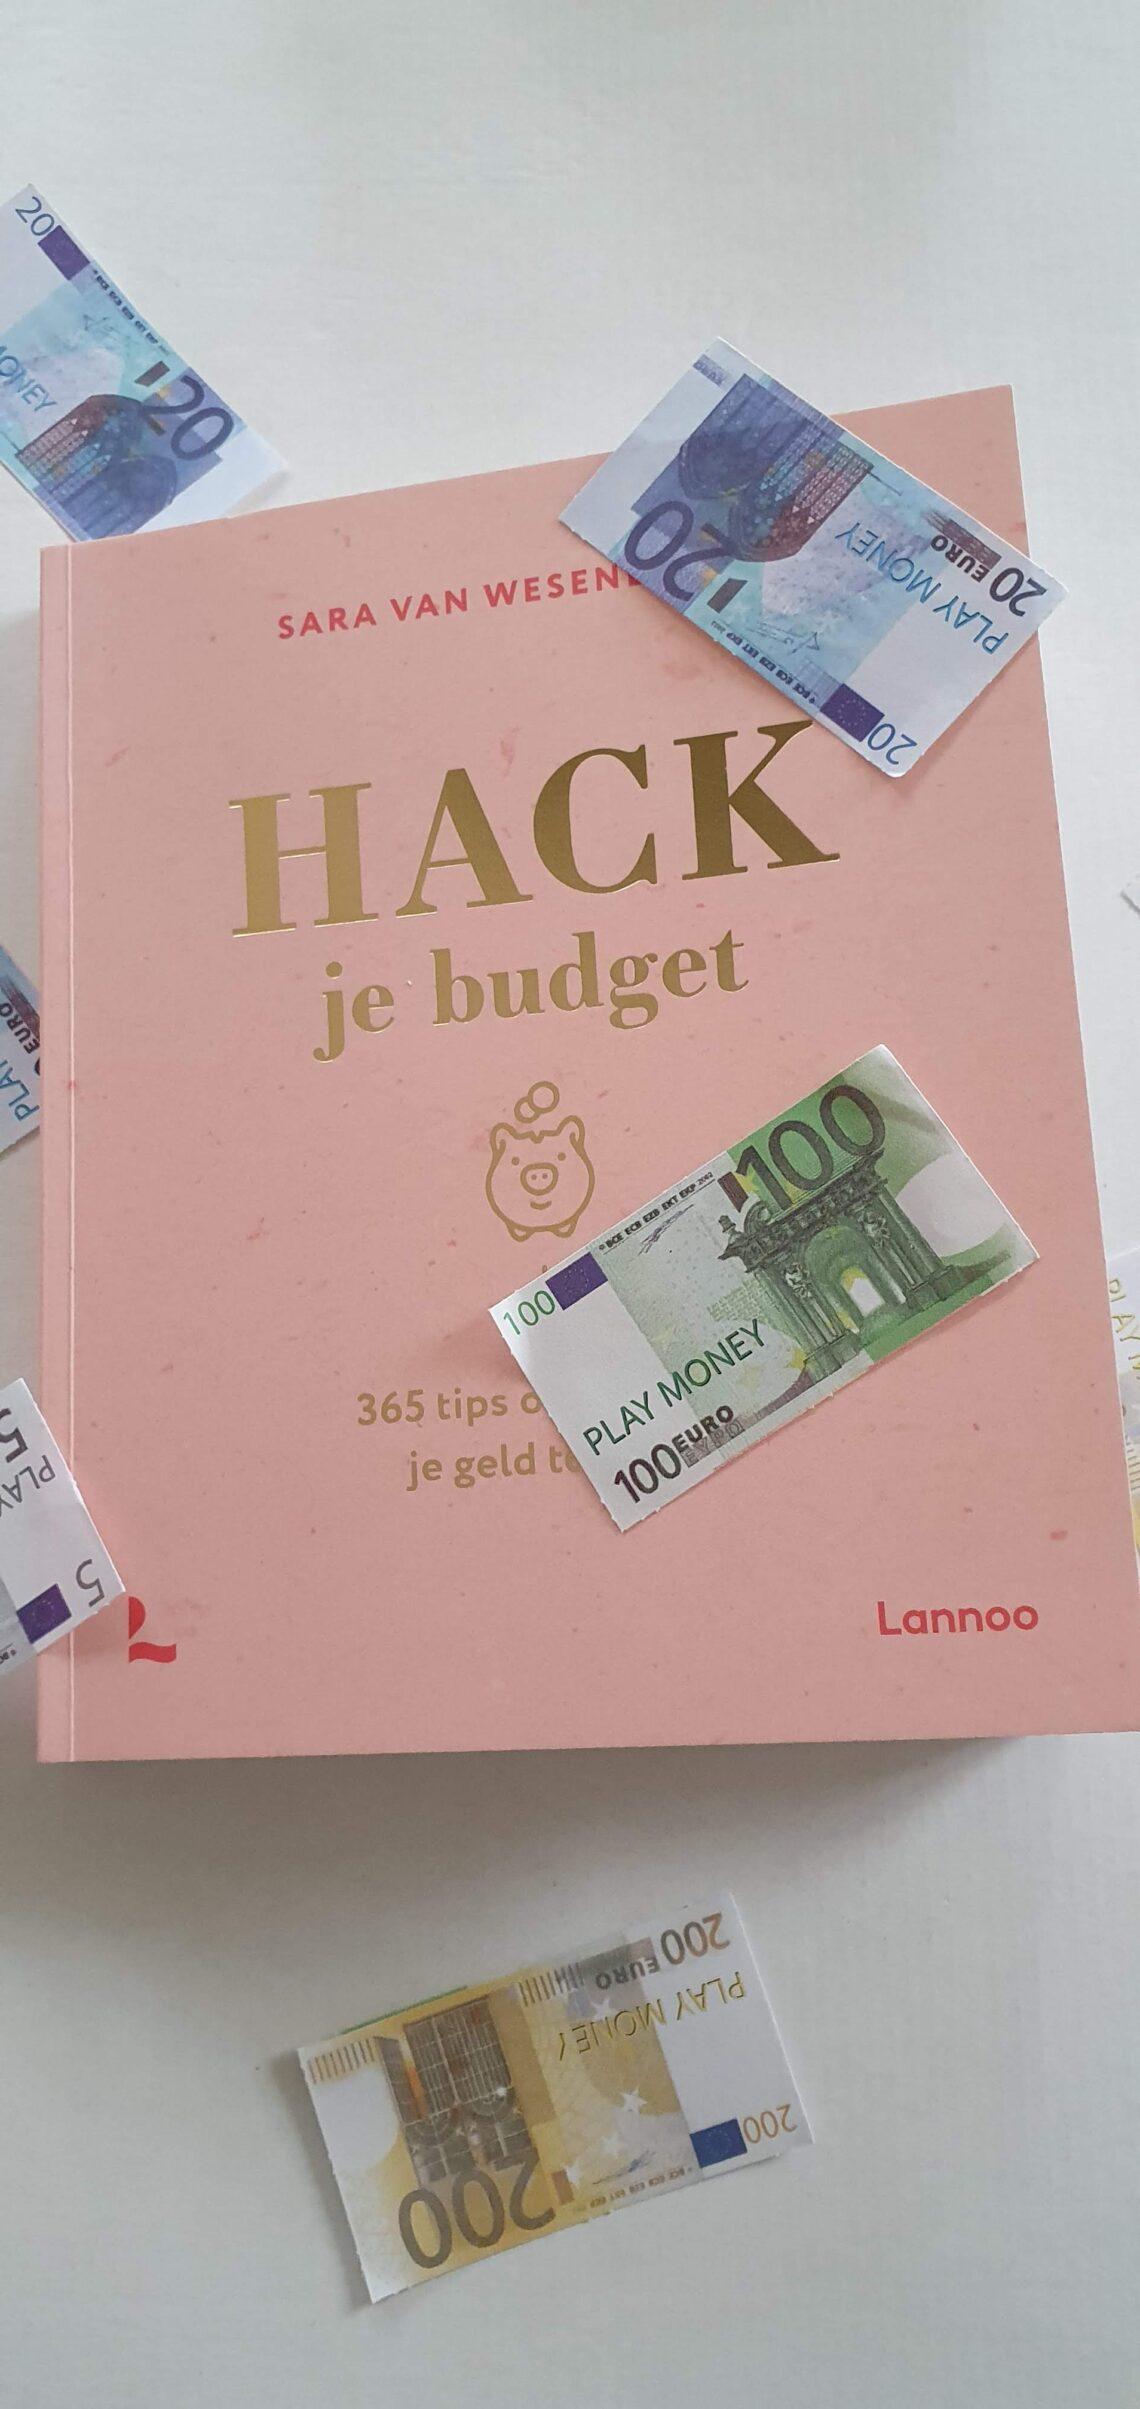 Hack je budget besparen